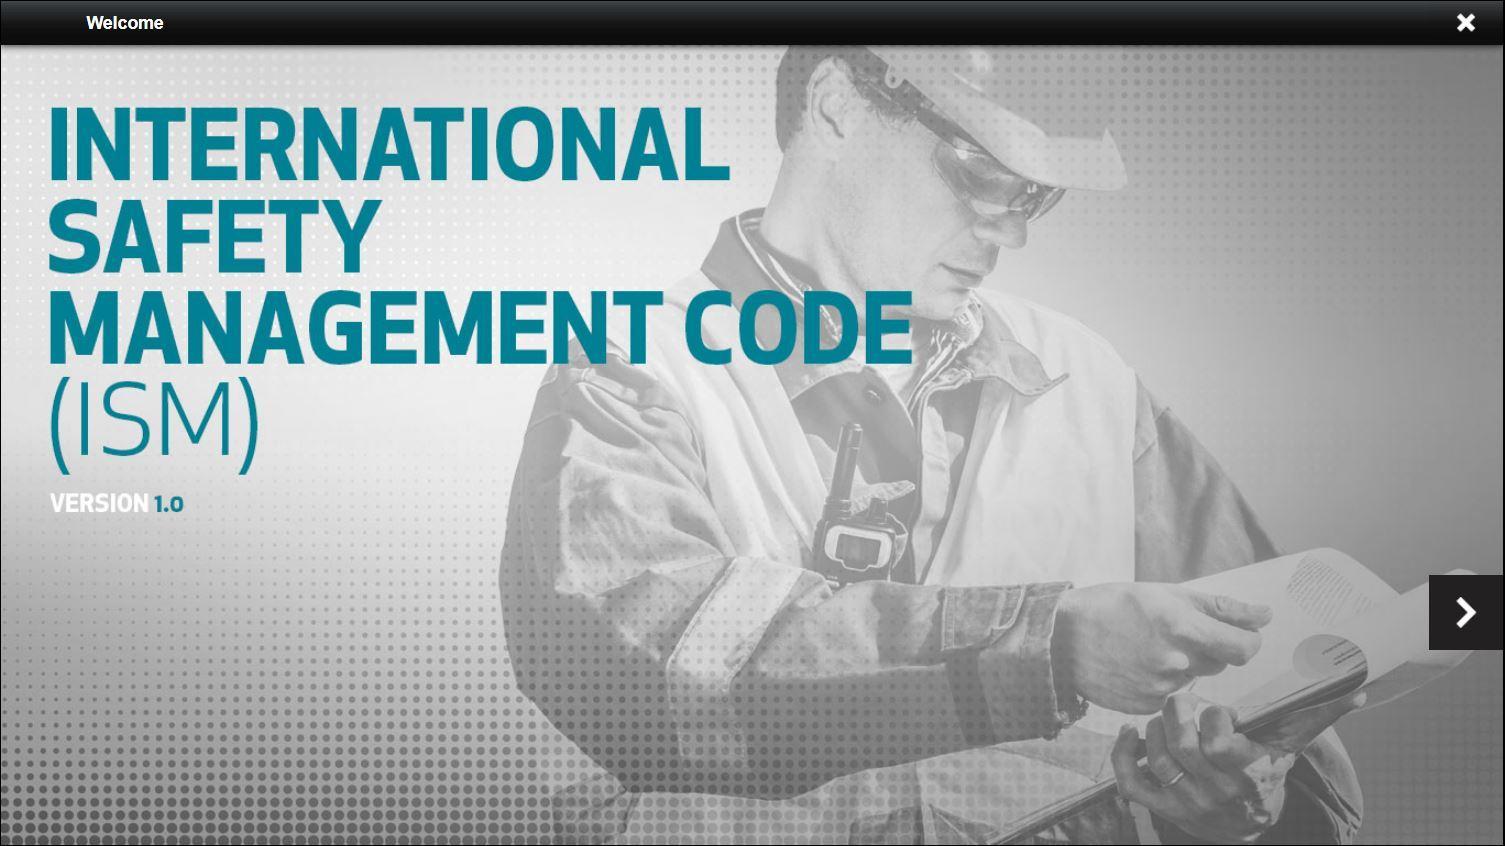 International Safety Management Code ISM Training 2